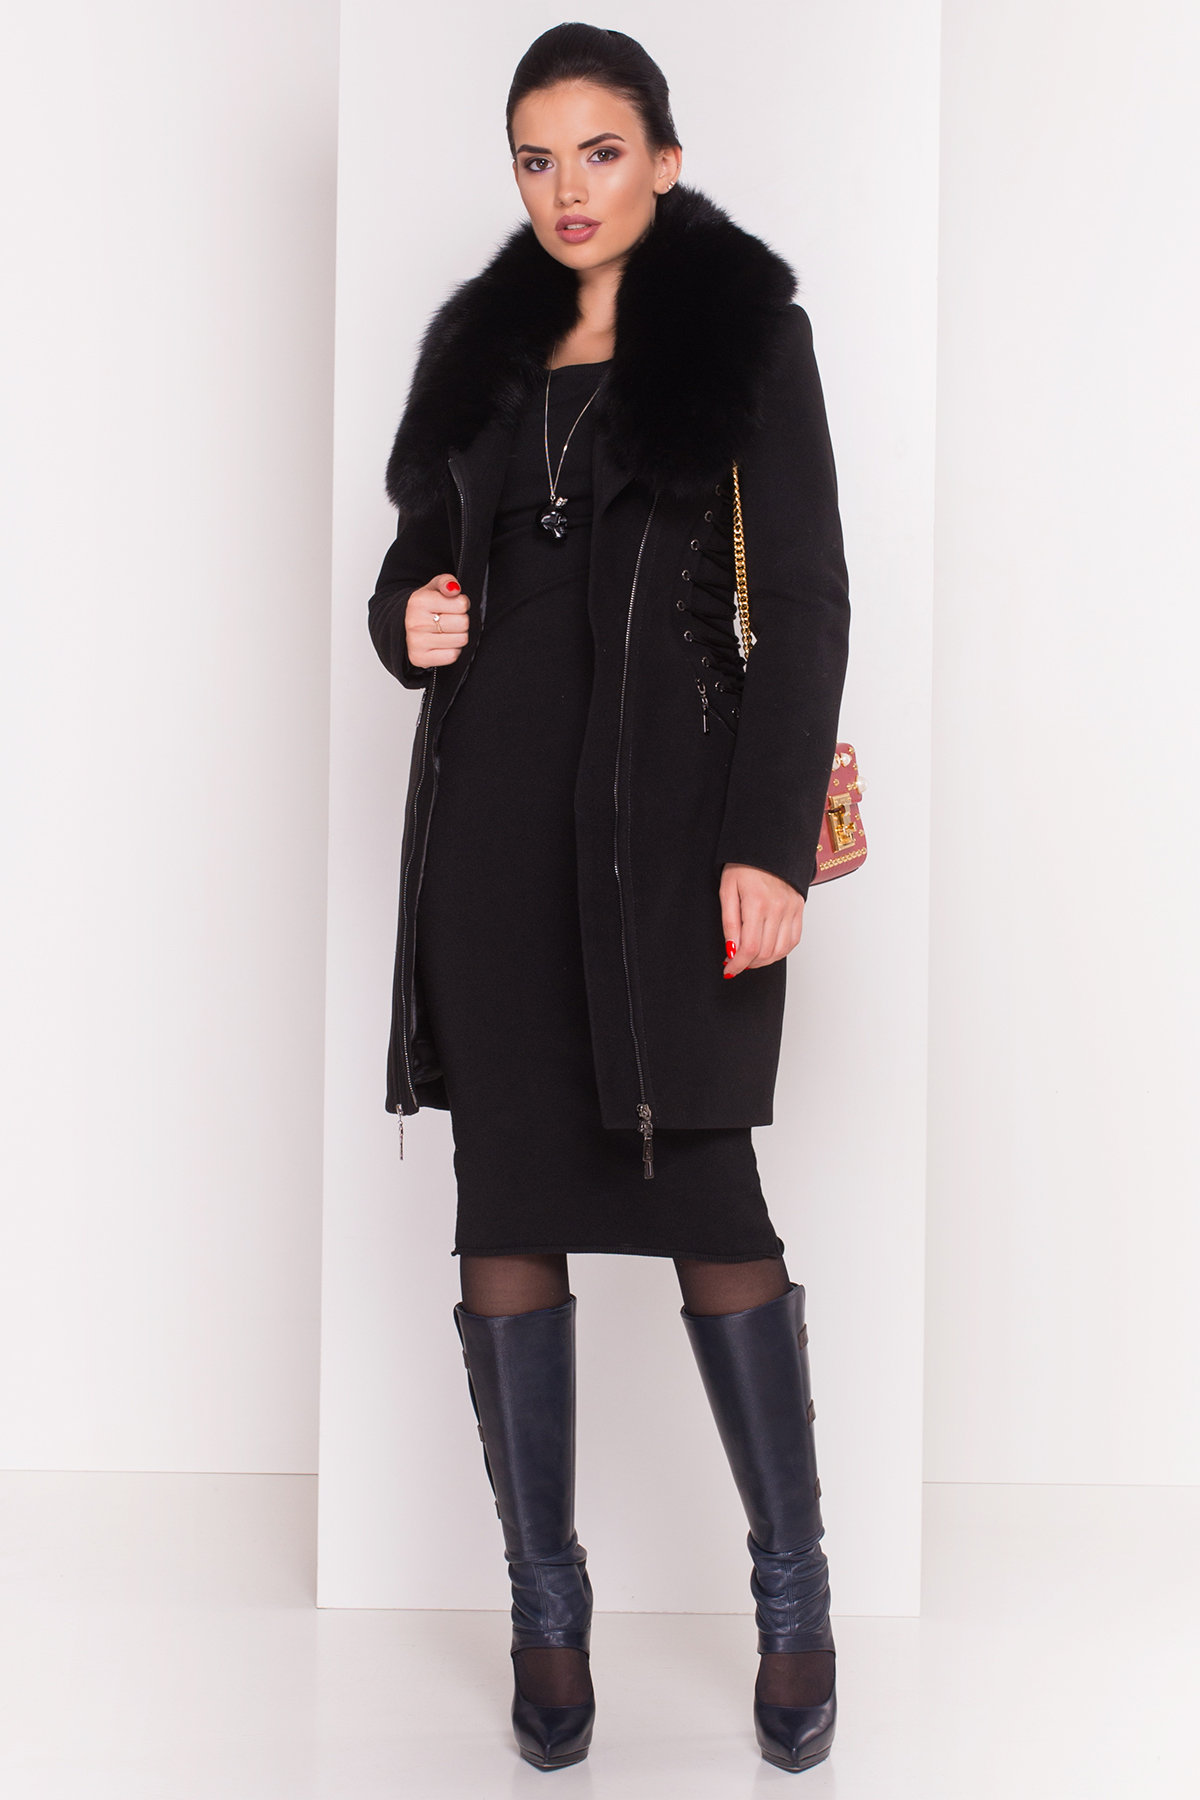 Пальто зима Бренд 0745  Цвет: Черный